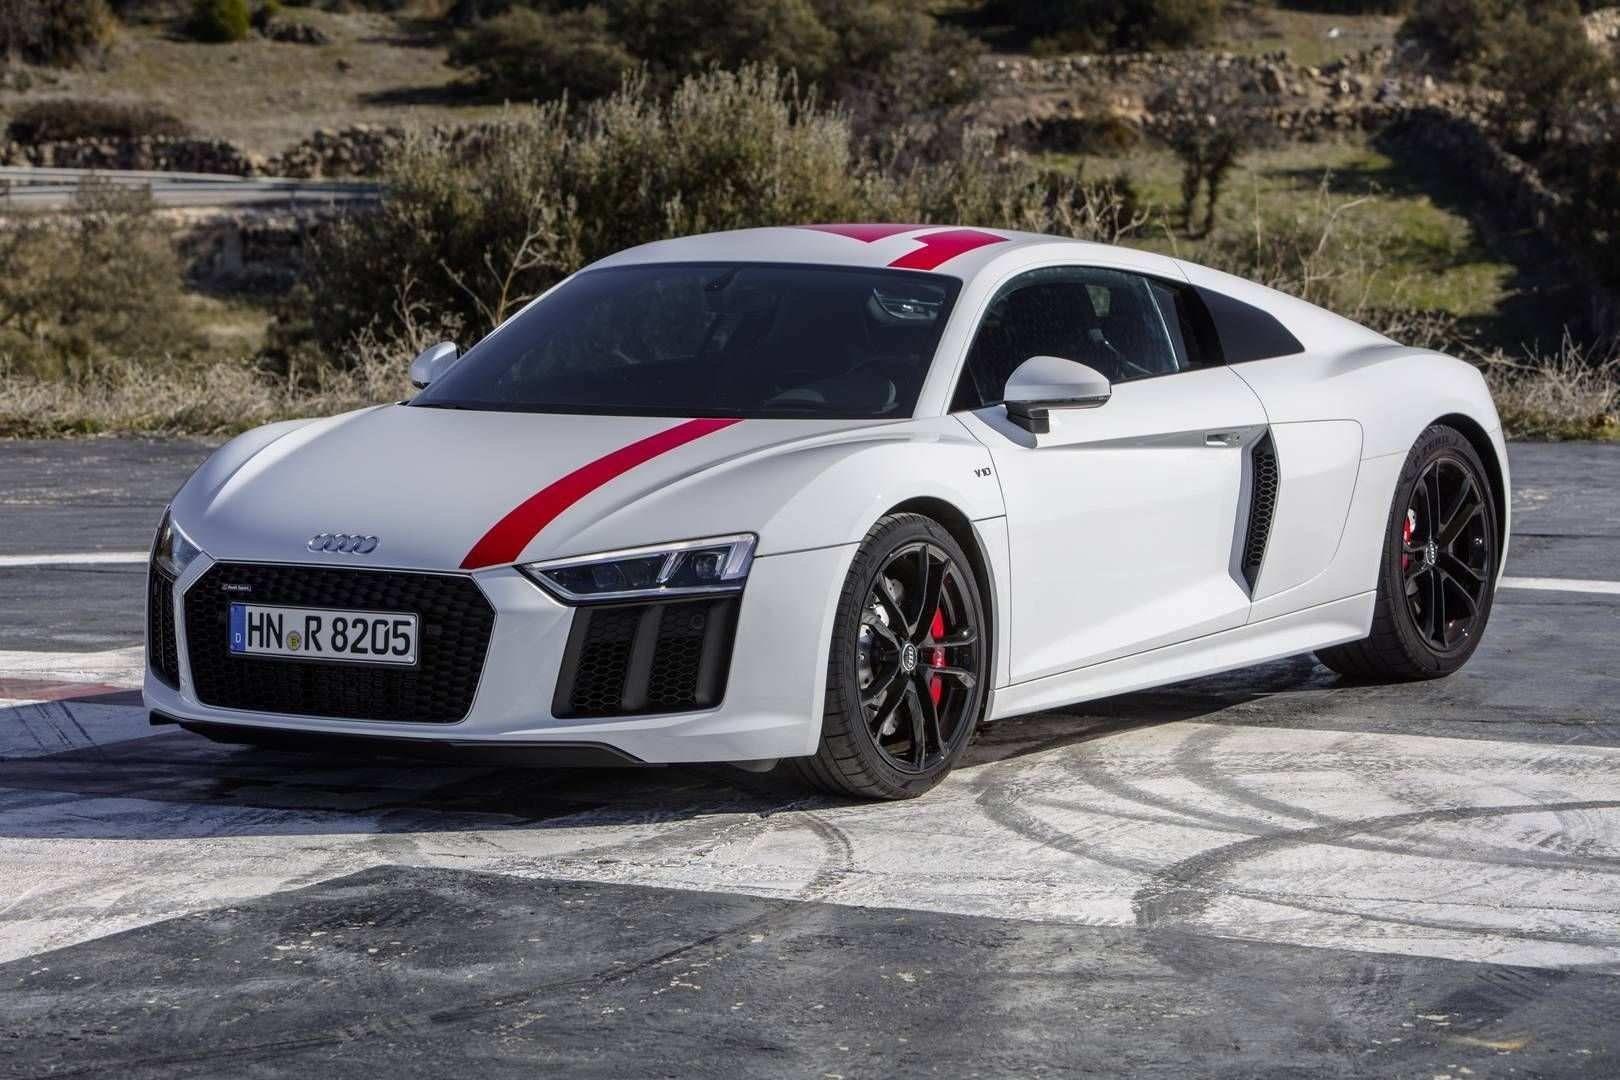 2020 Audi R8 LMXs Reviews